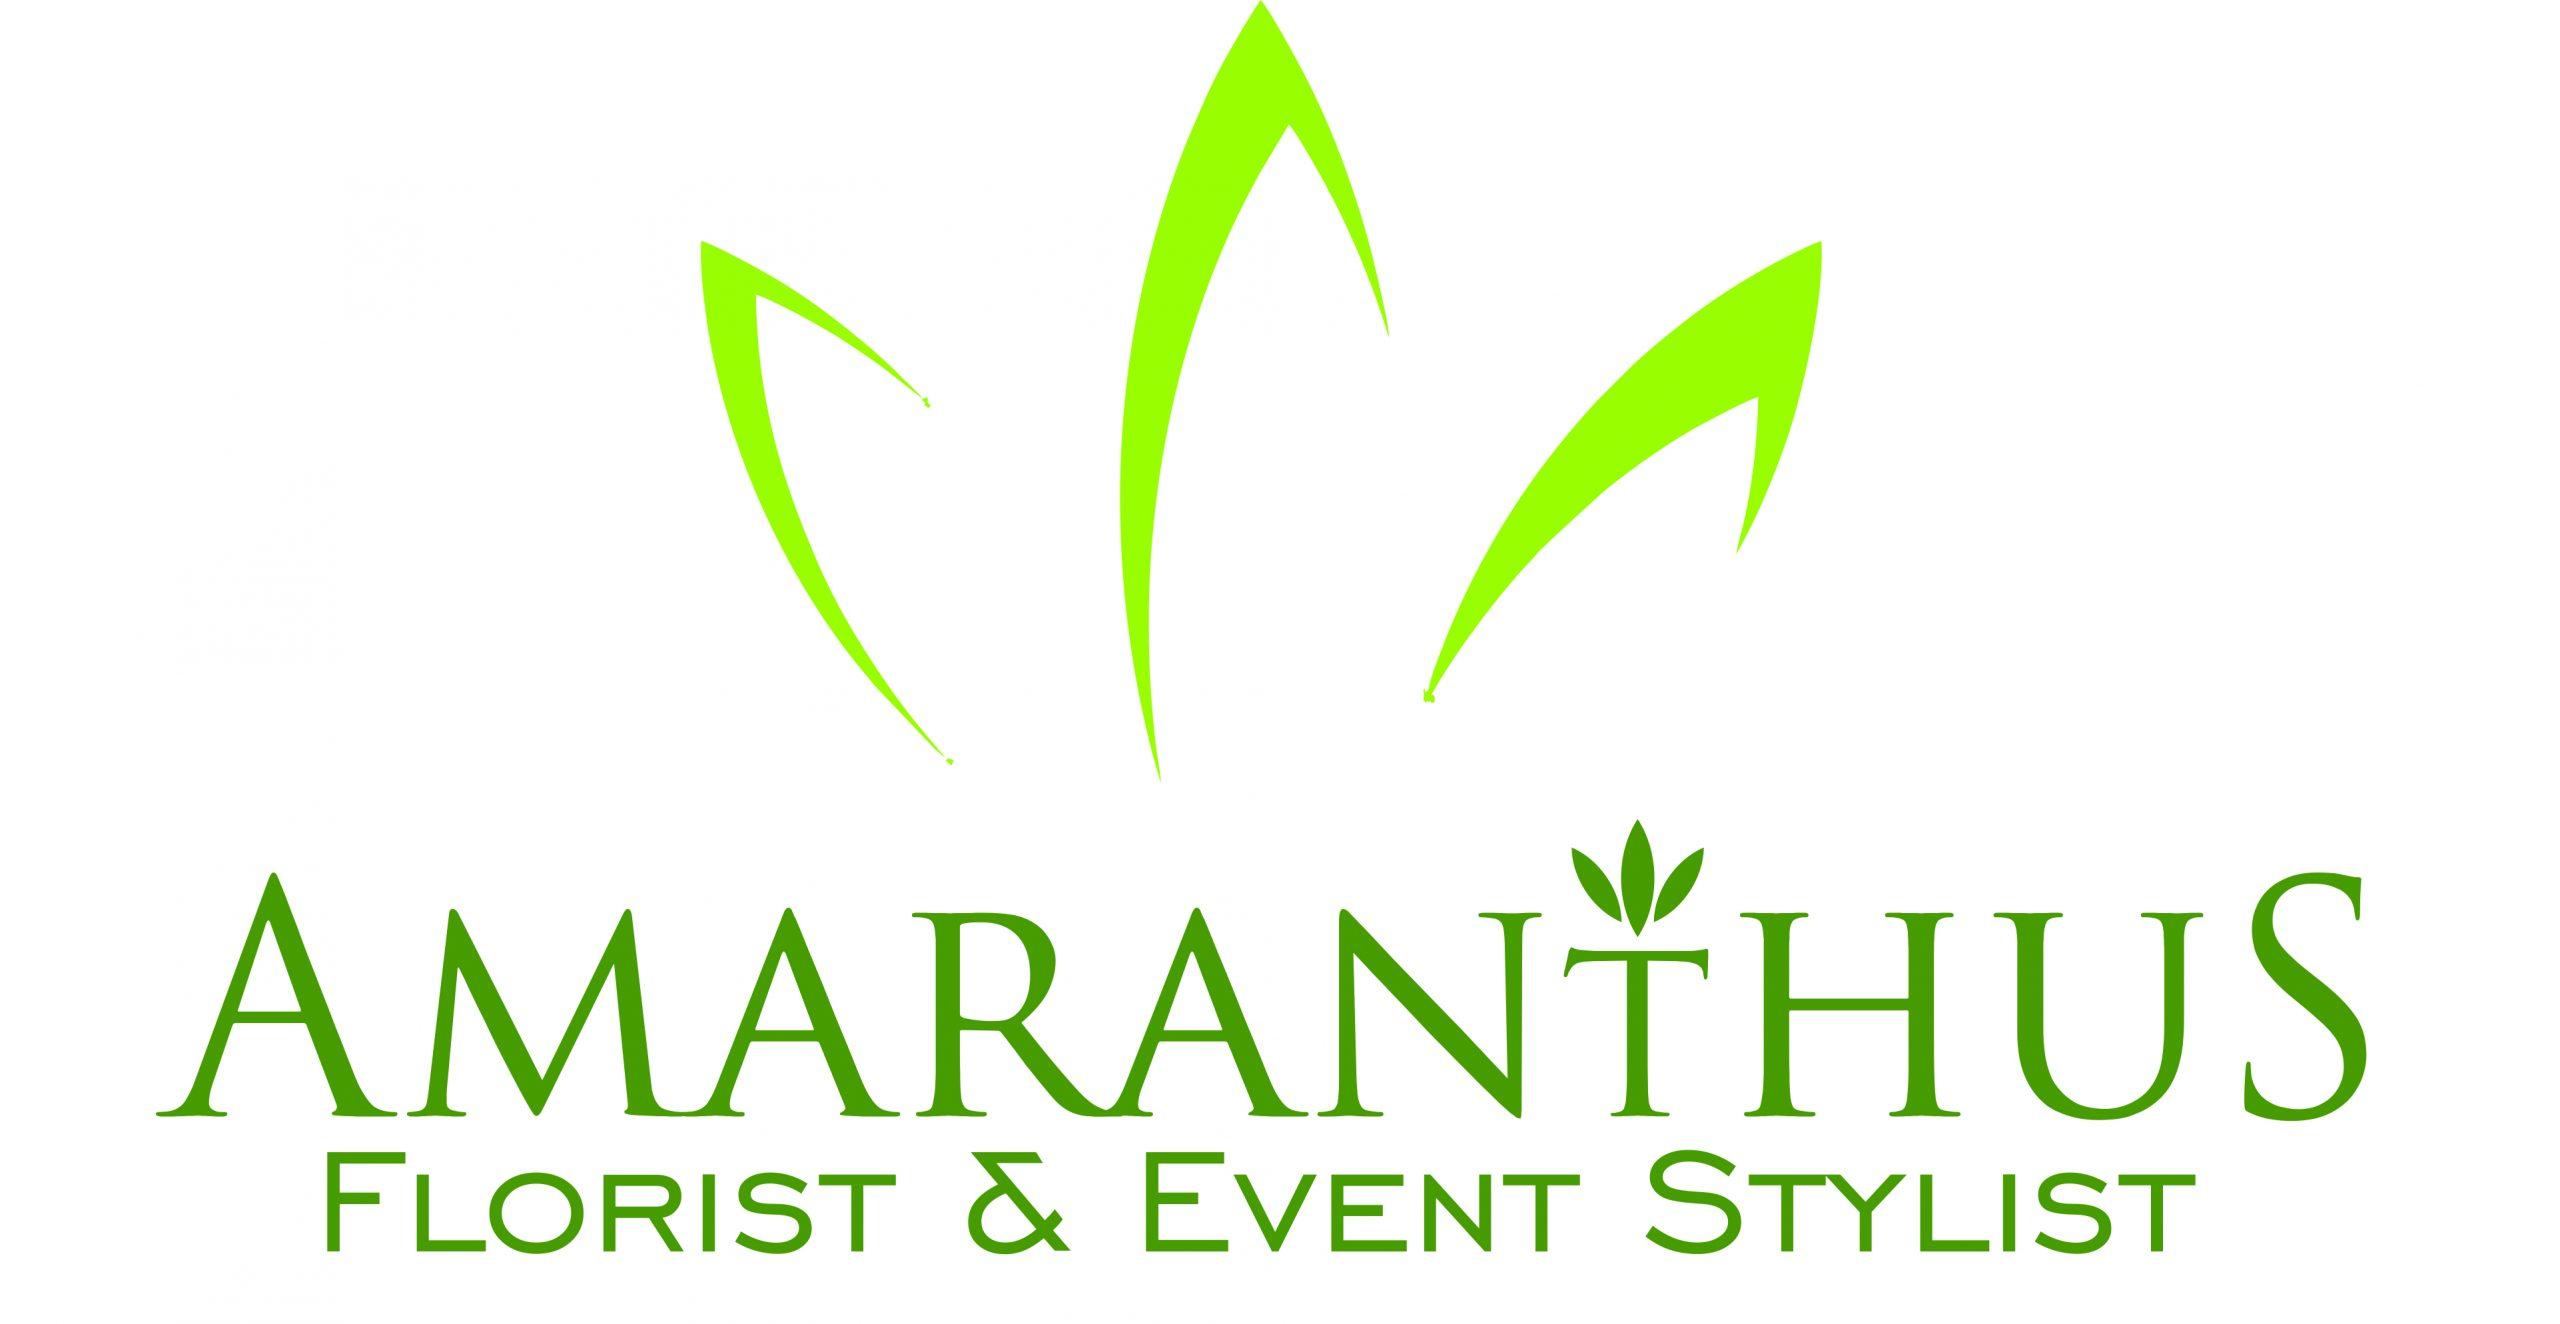 Amaranthus Florist & Event Stylist